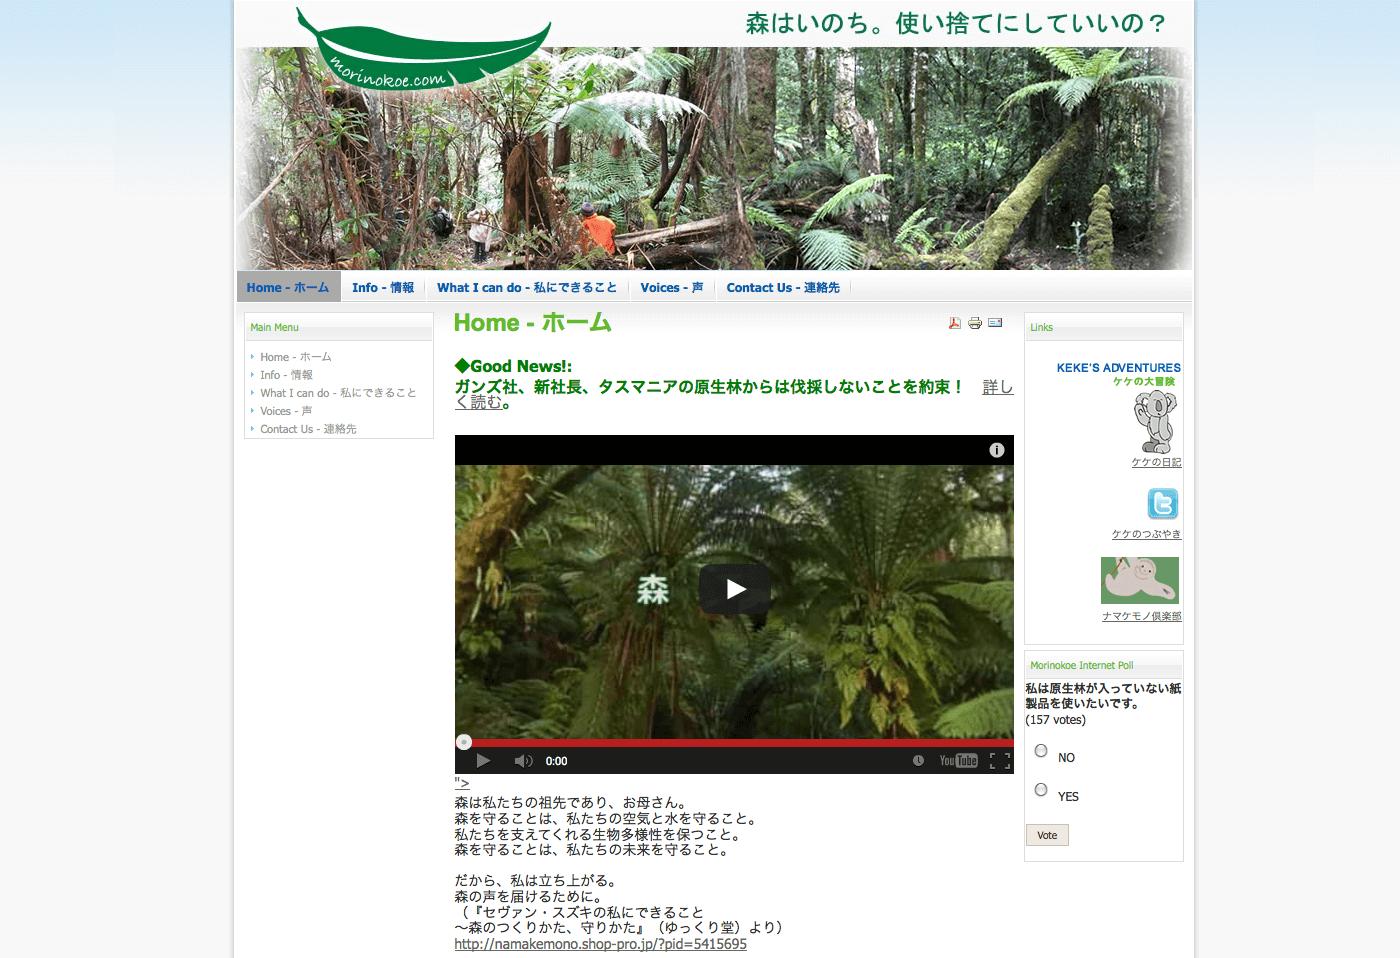 Able Video Morinokoe Website